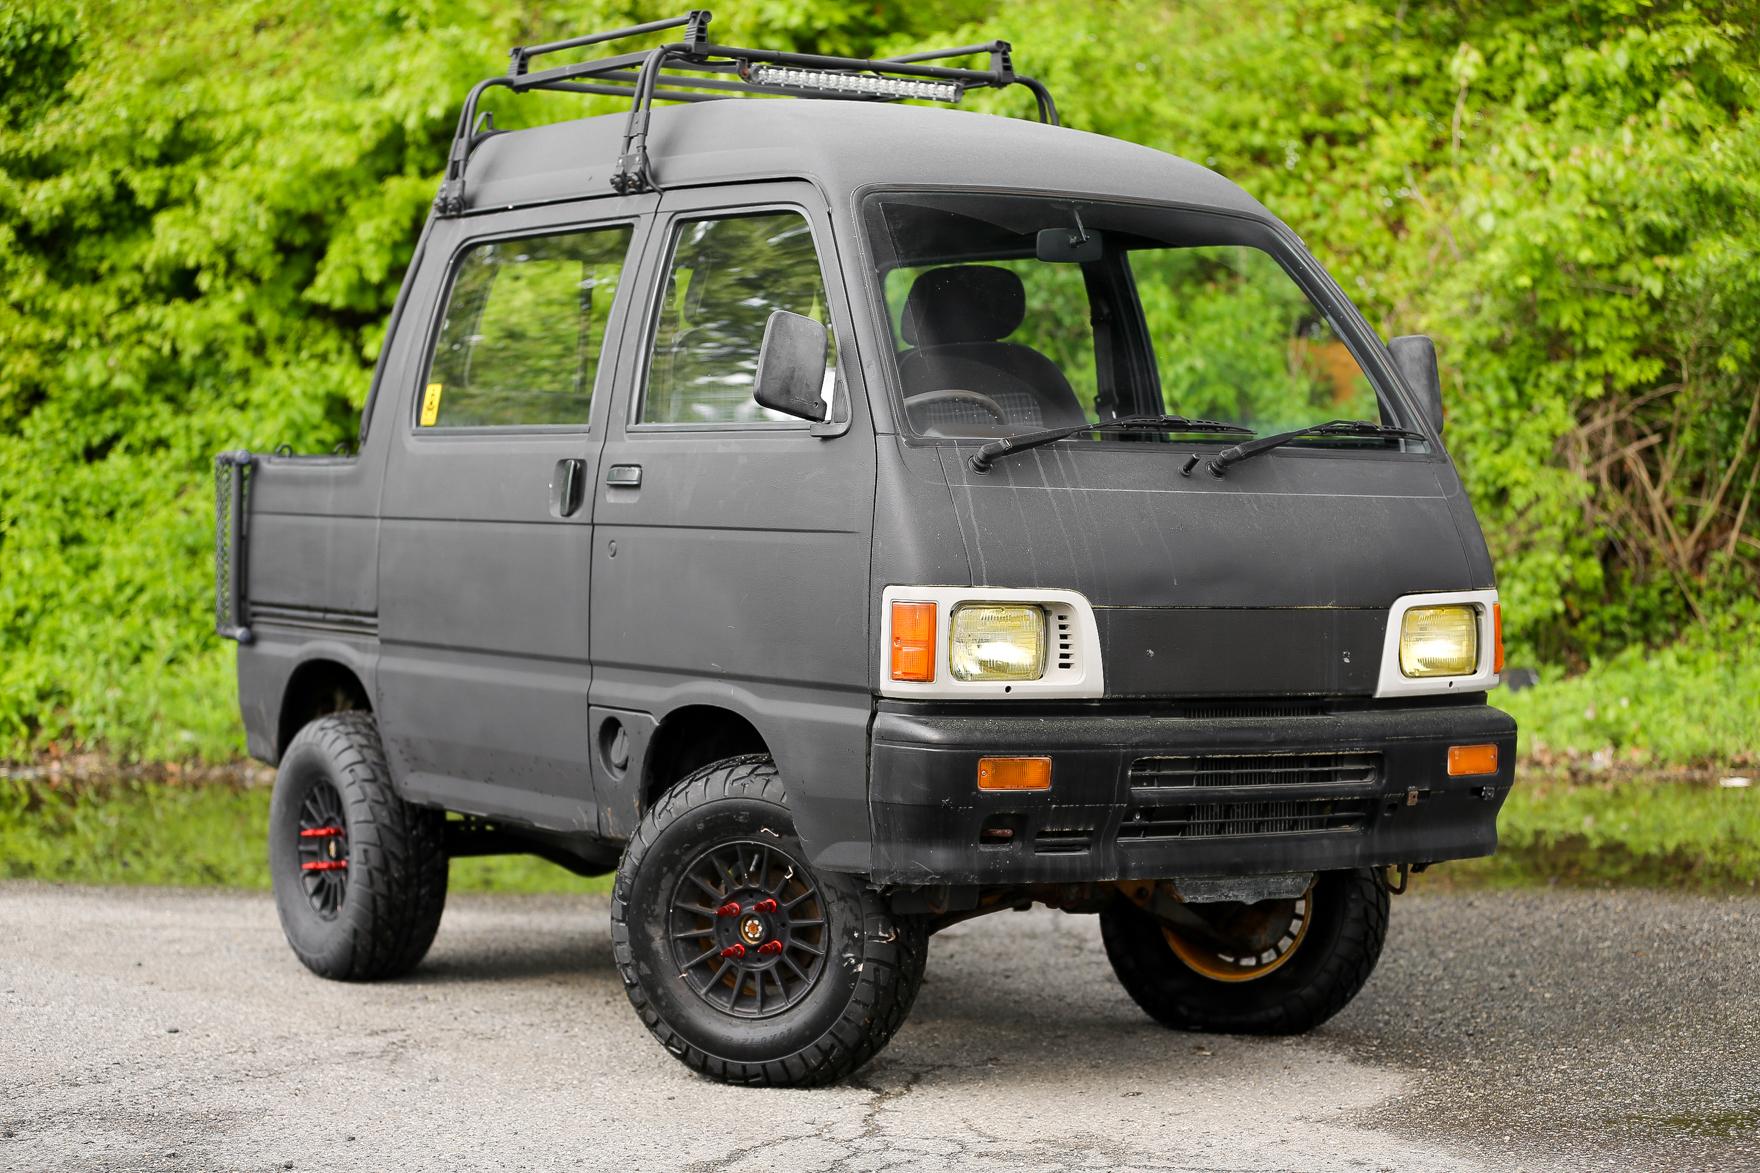 1992 Daihatsu HiJet Deckvan - $8,200